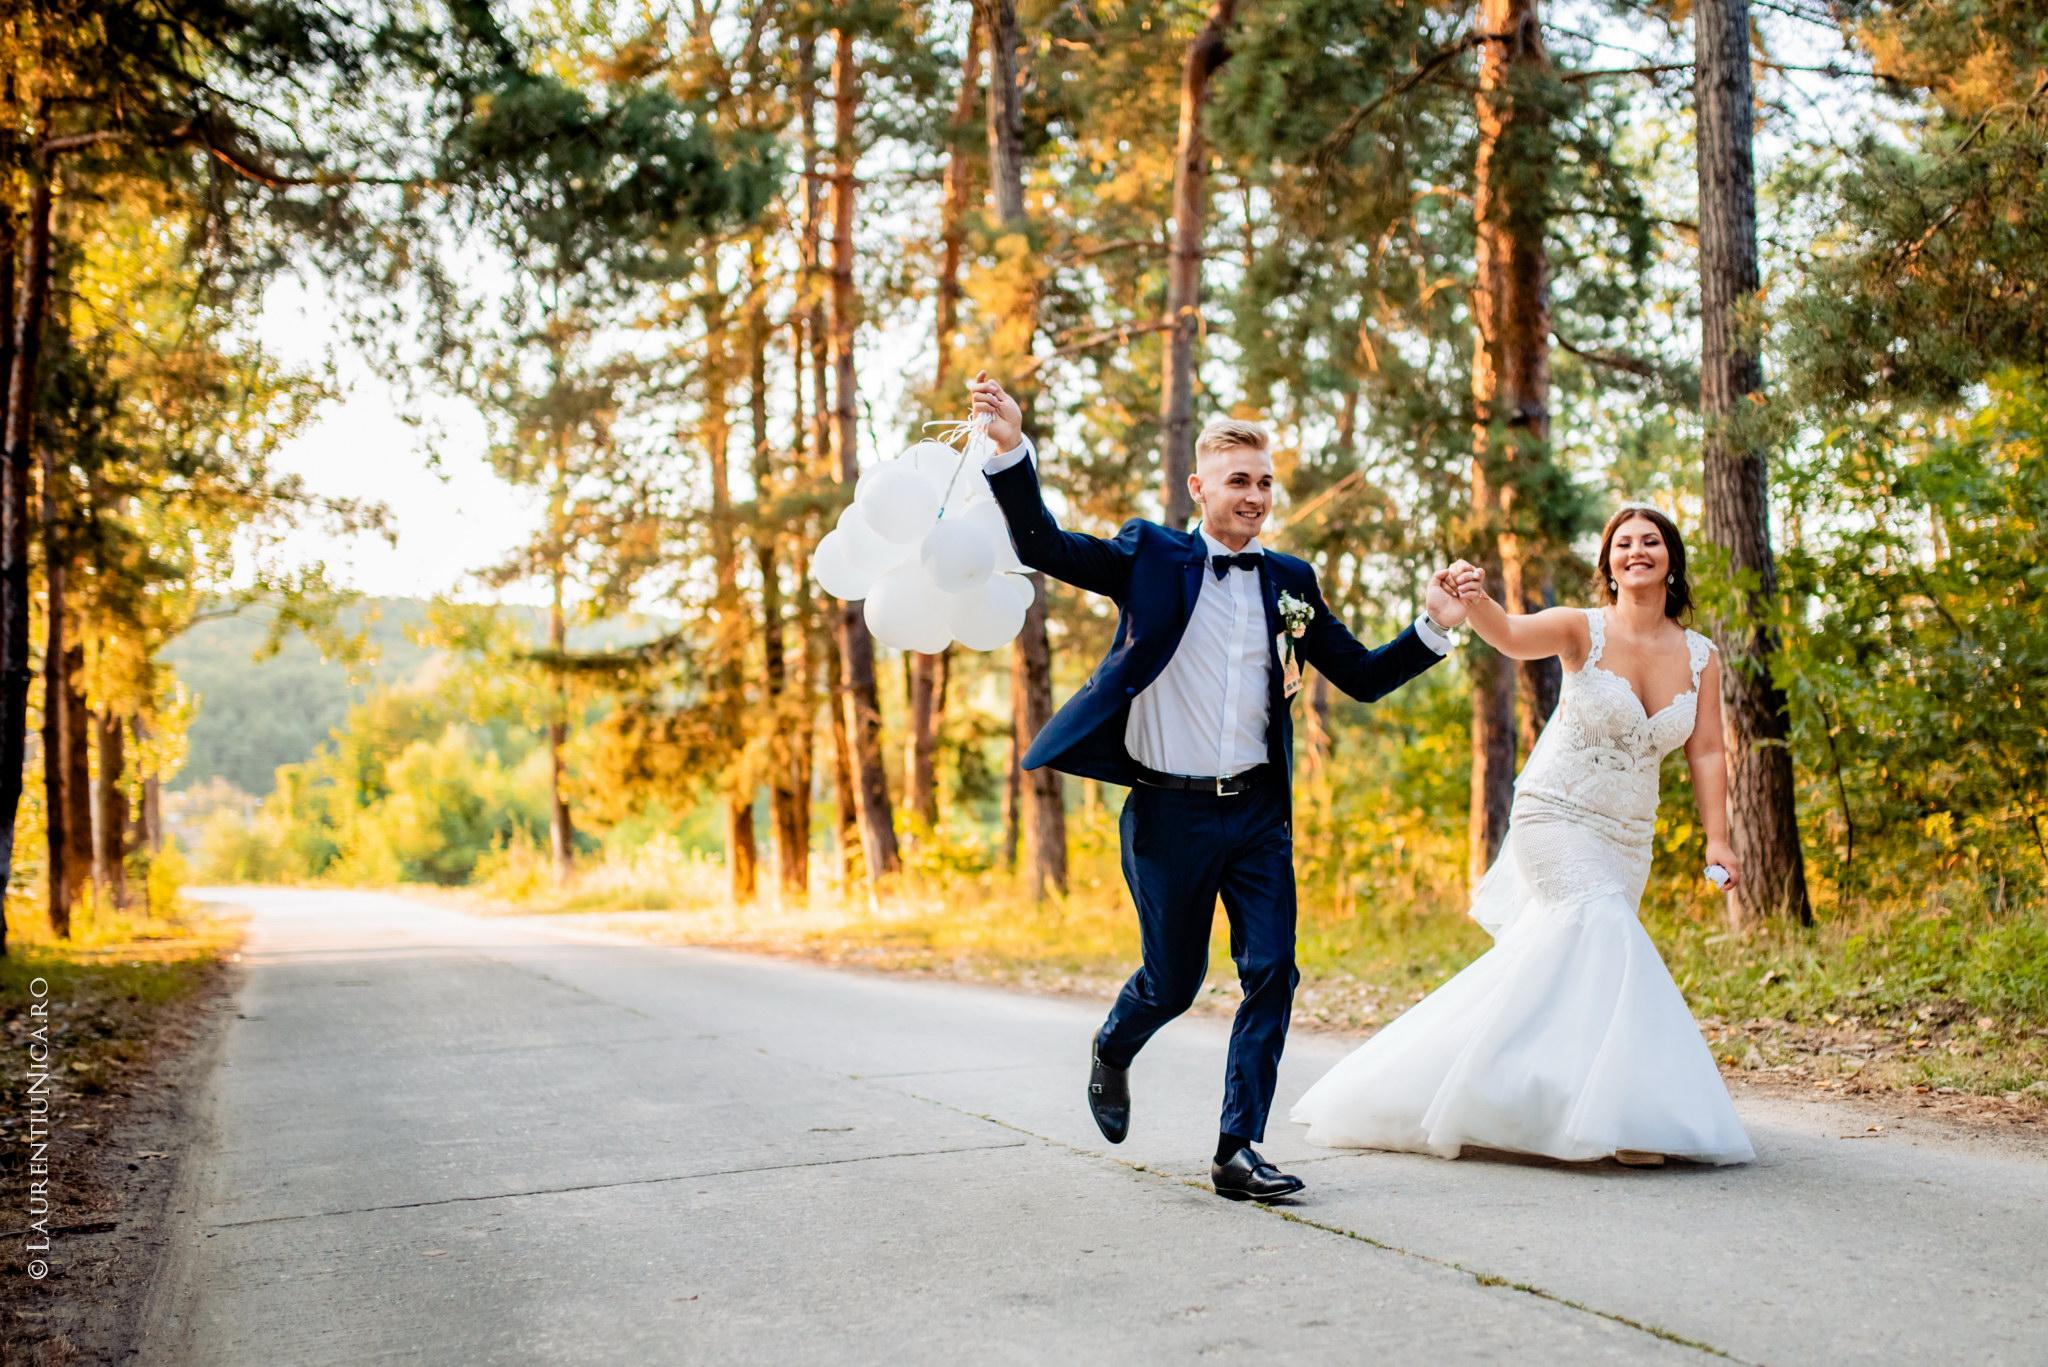 fotografii nunta Roxana si Cosmin fotograf nunta laurentiu nica 32 - Roxana & Cosmin | Fotografii nunta | Ticleni, judetul Gorj